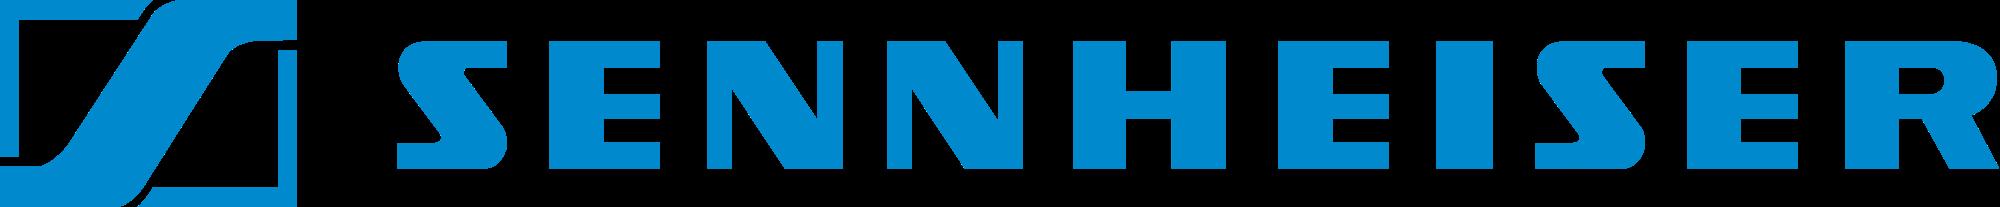 Sennheiser-Logo_svg